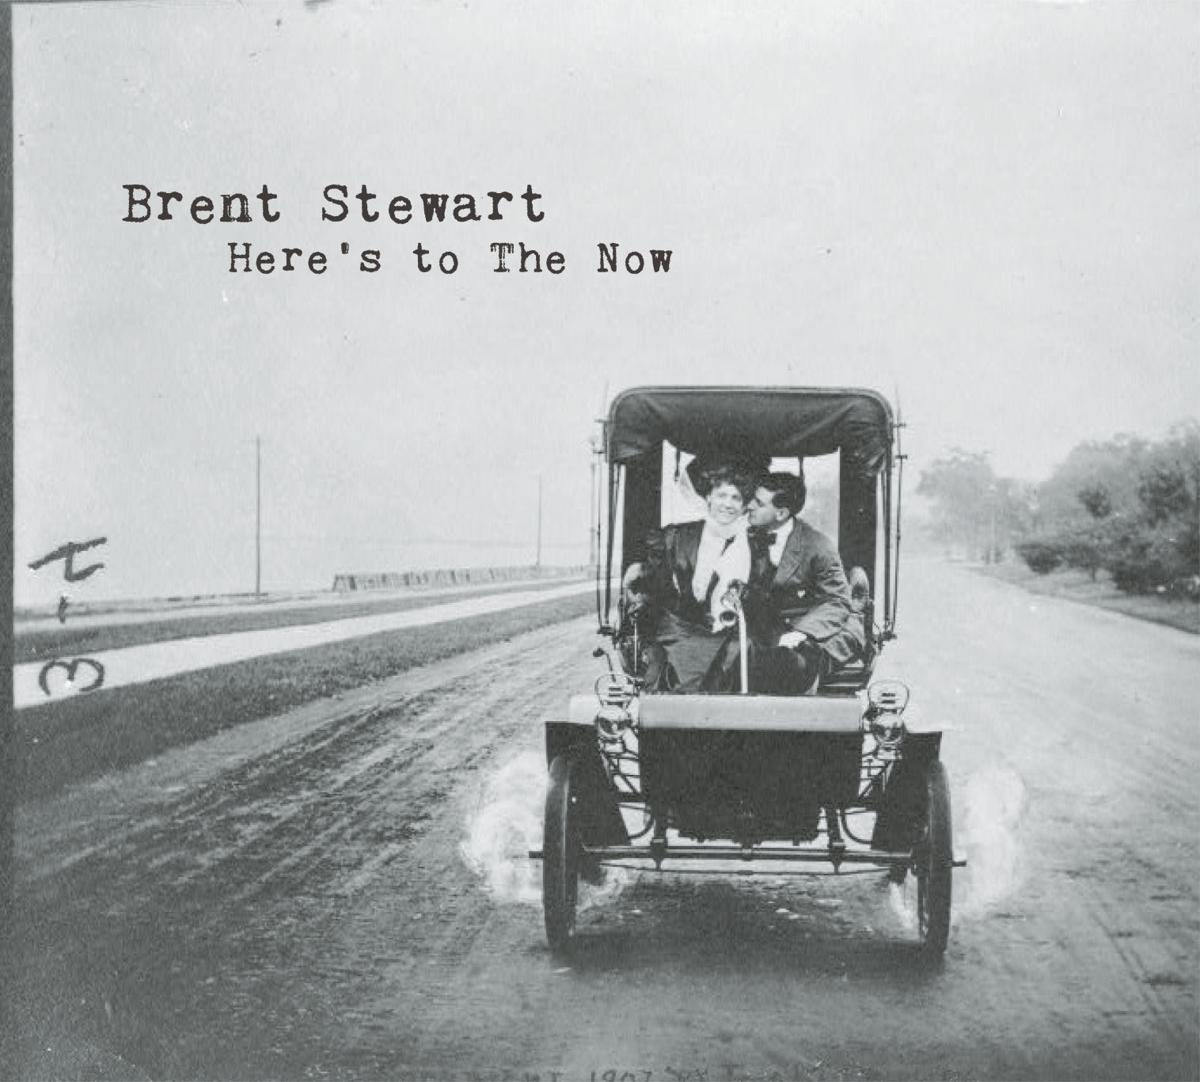 Brent Stewart - Album Cover